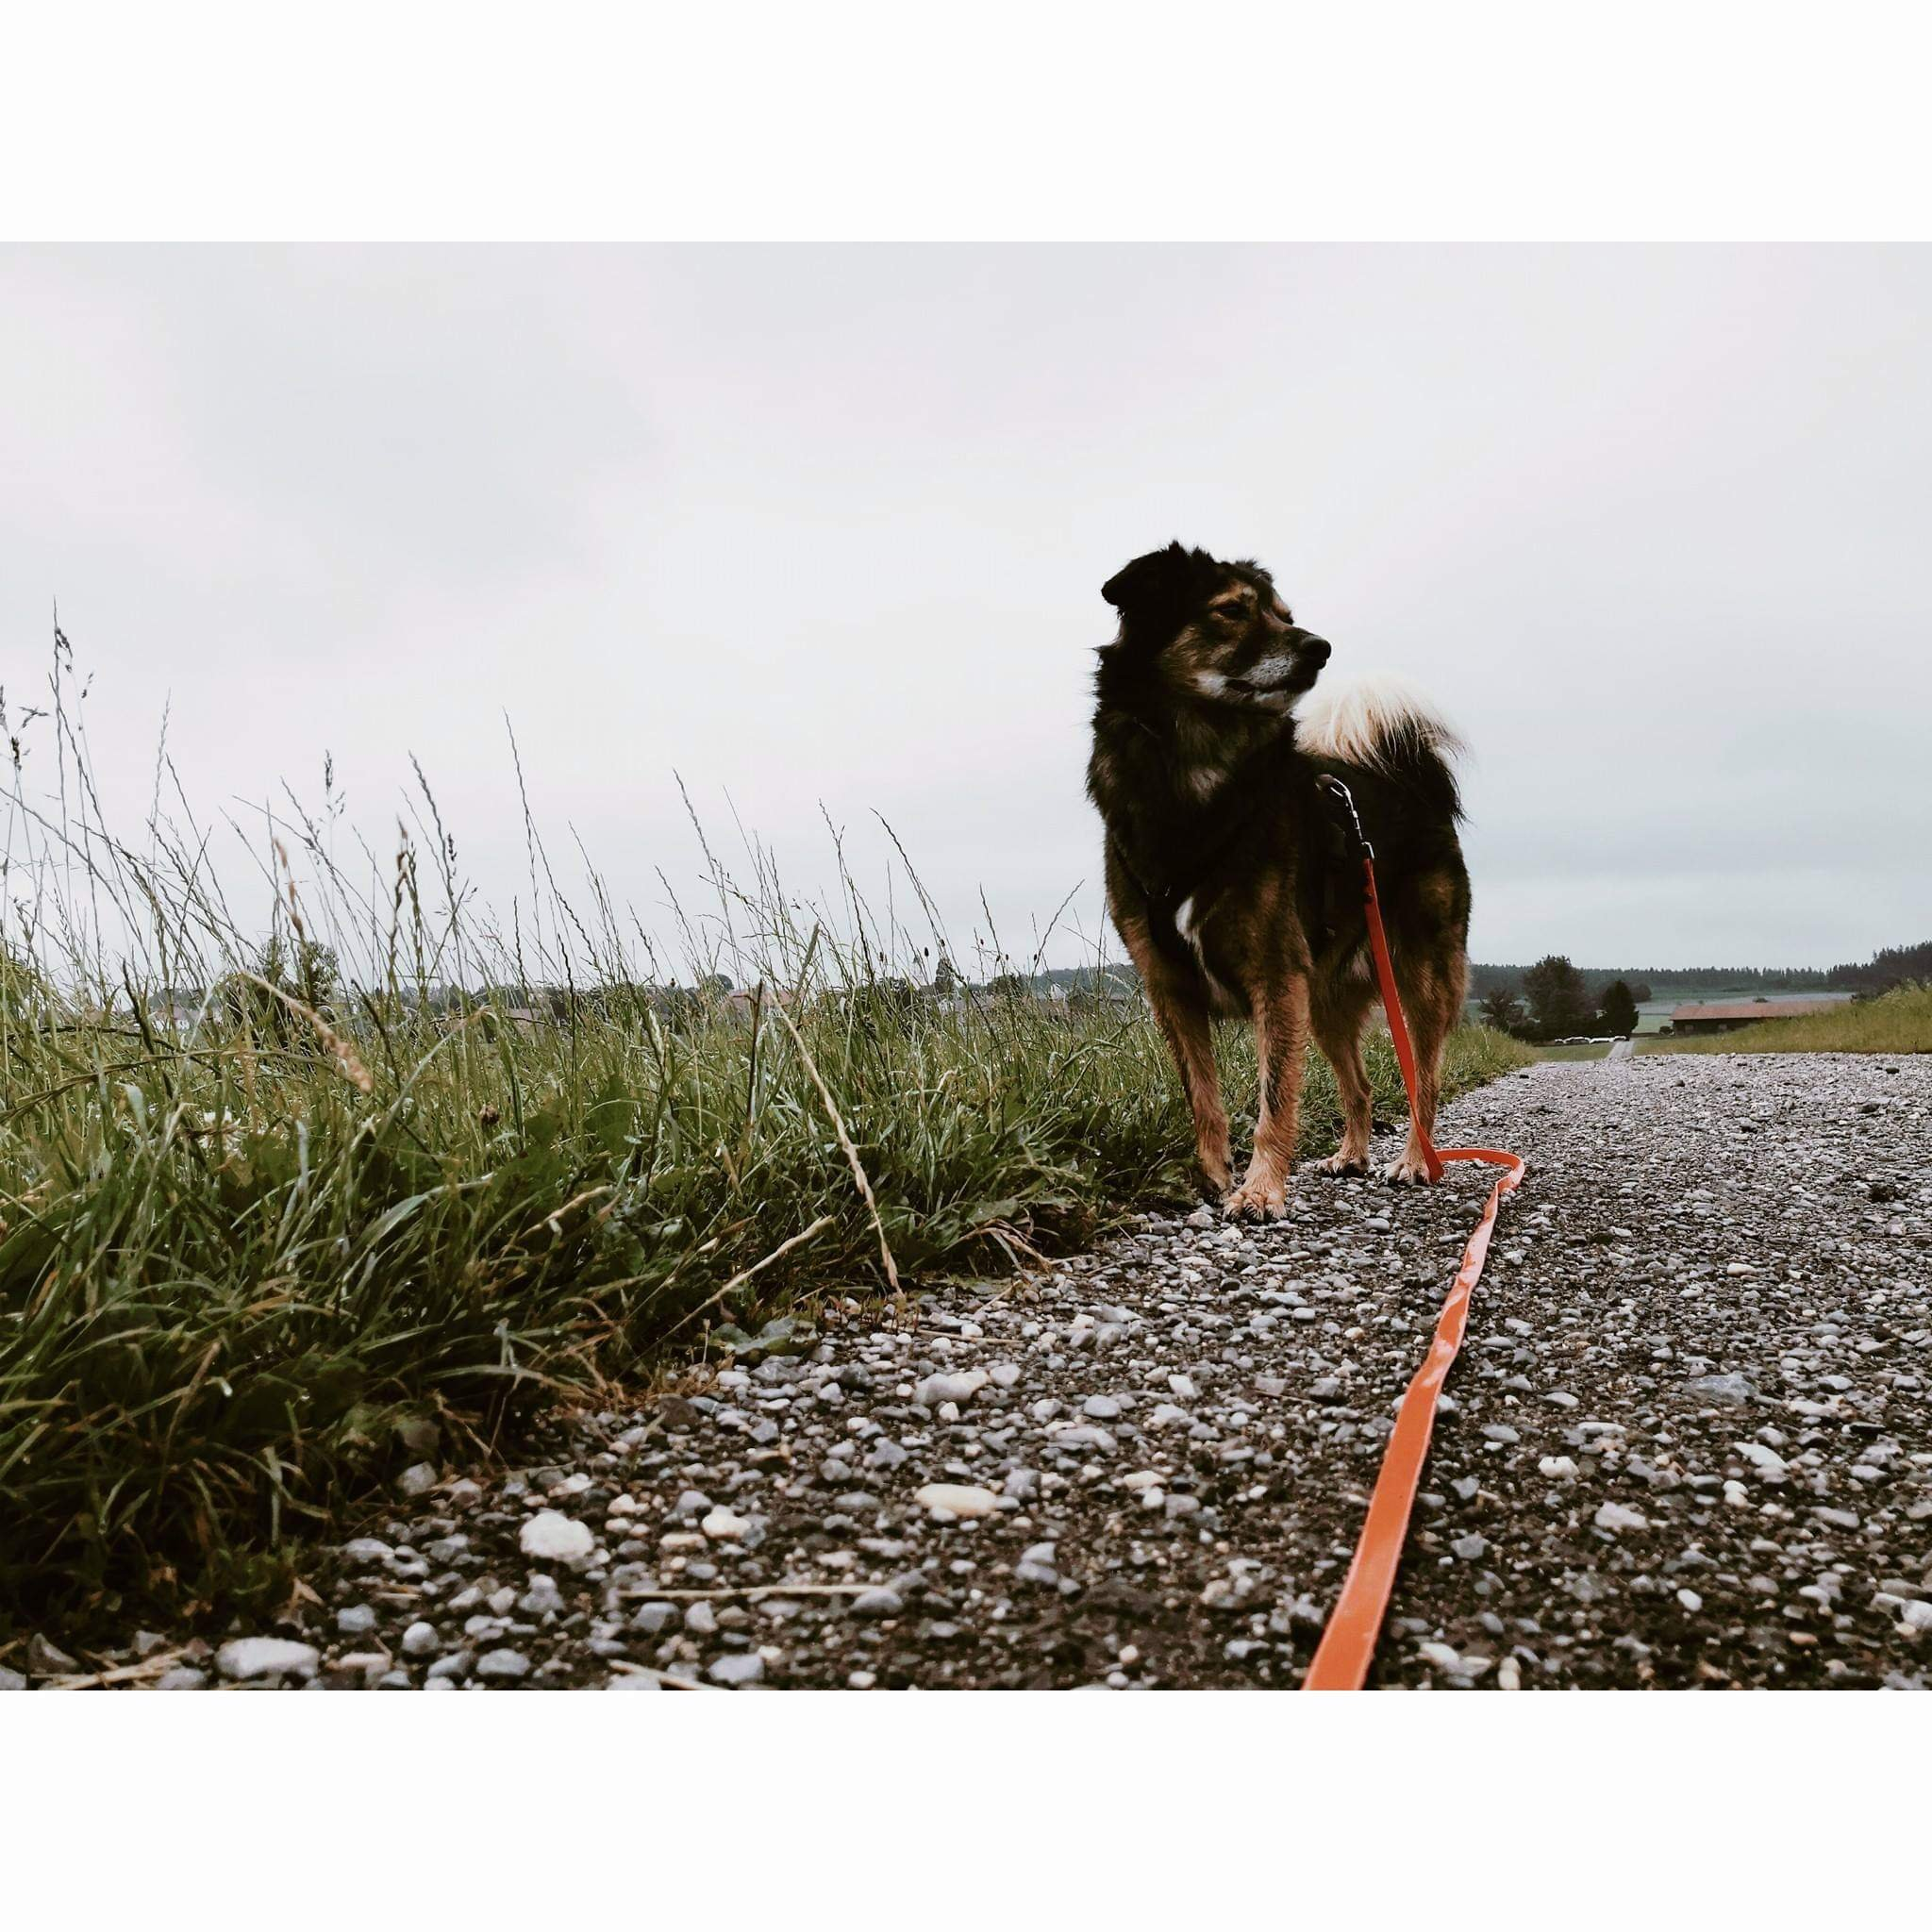 Hundeblog Canistecture Hund auf straße